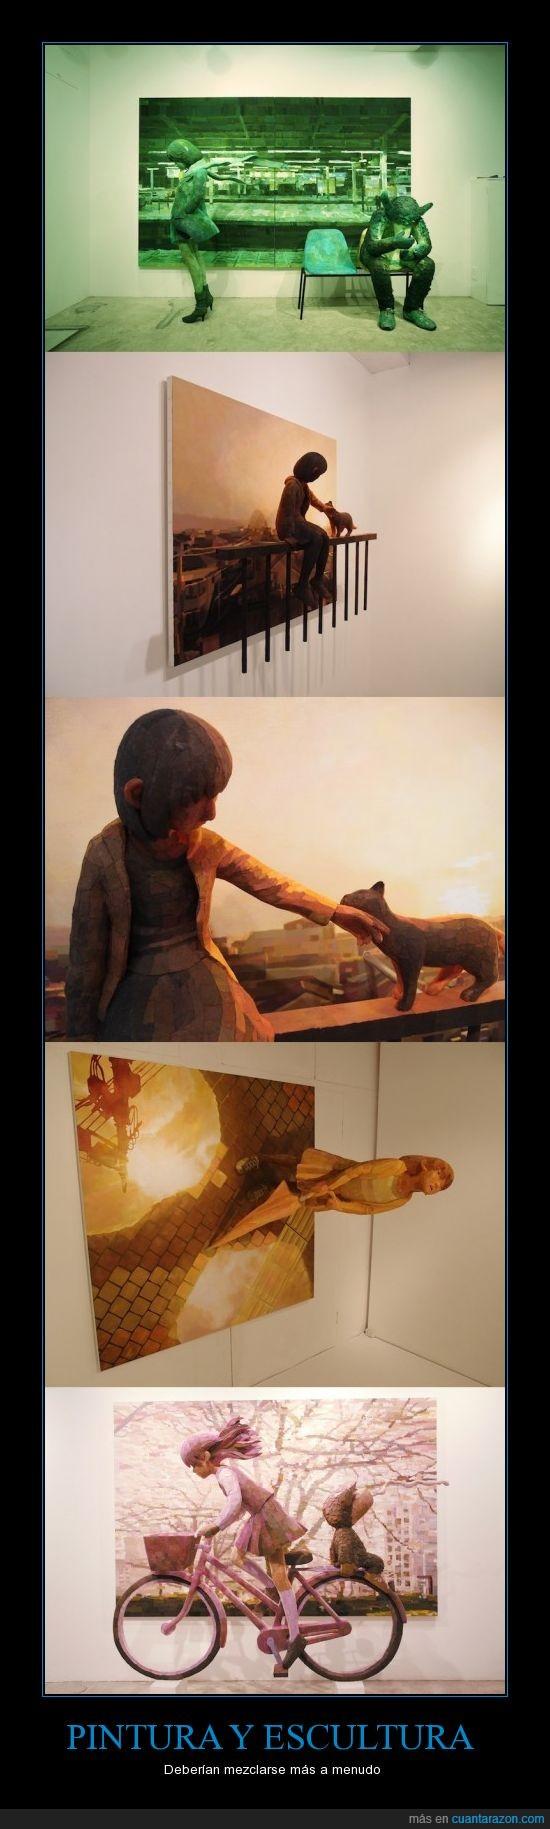 arte,escultura,original,pintura